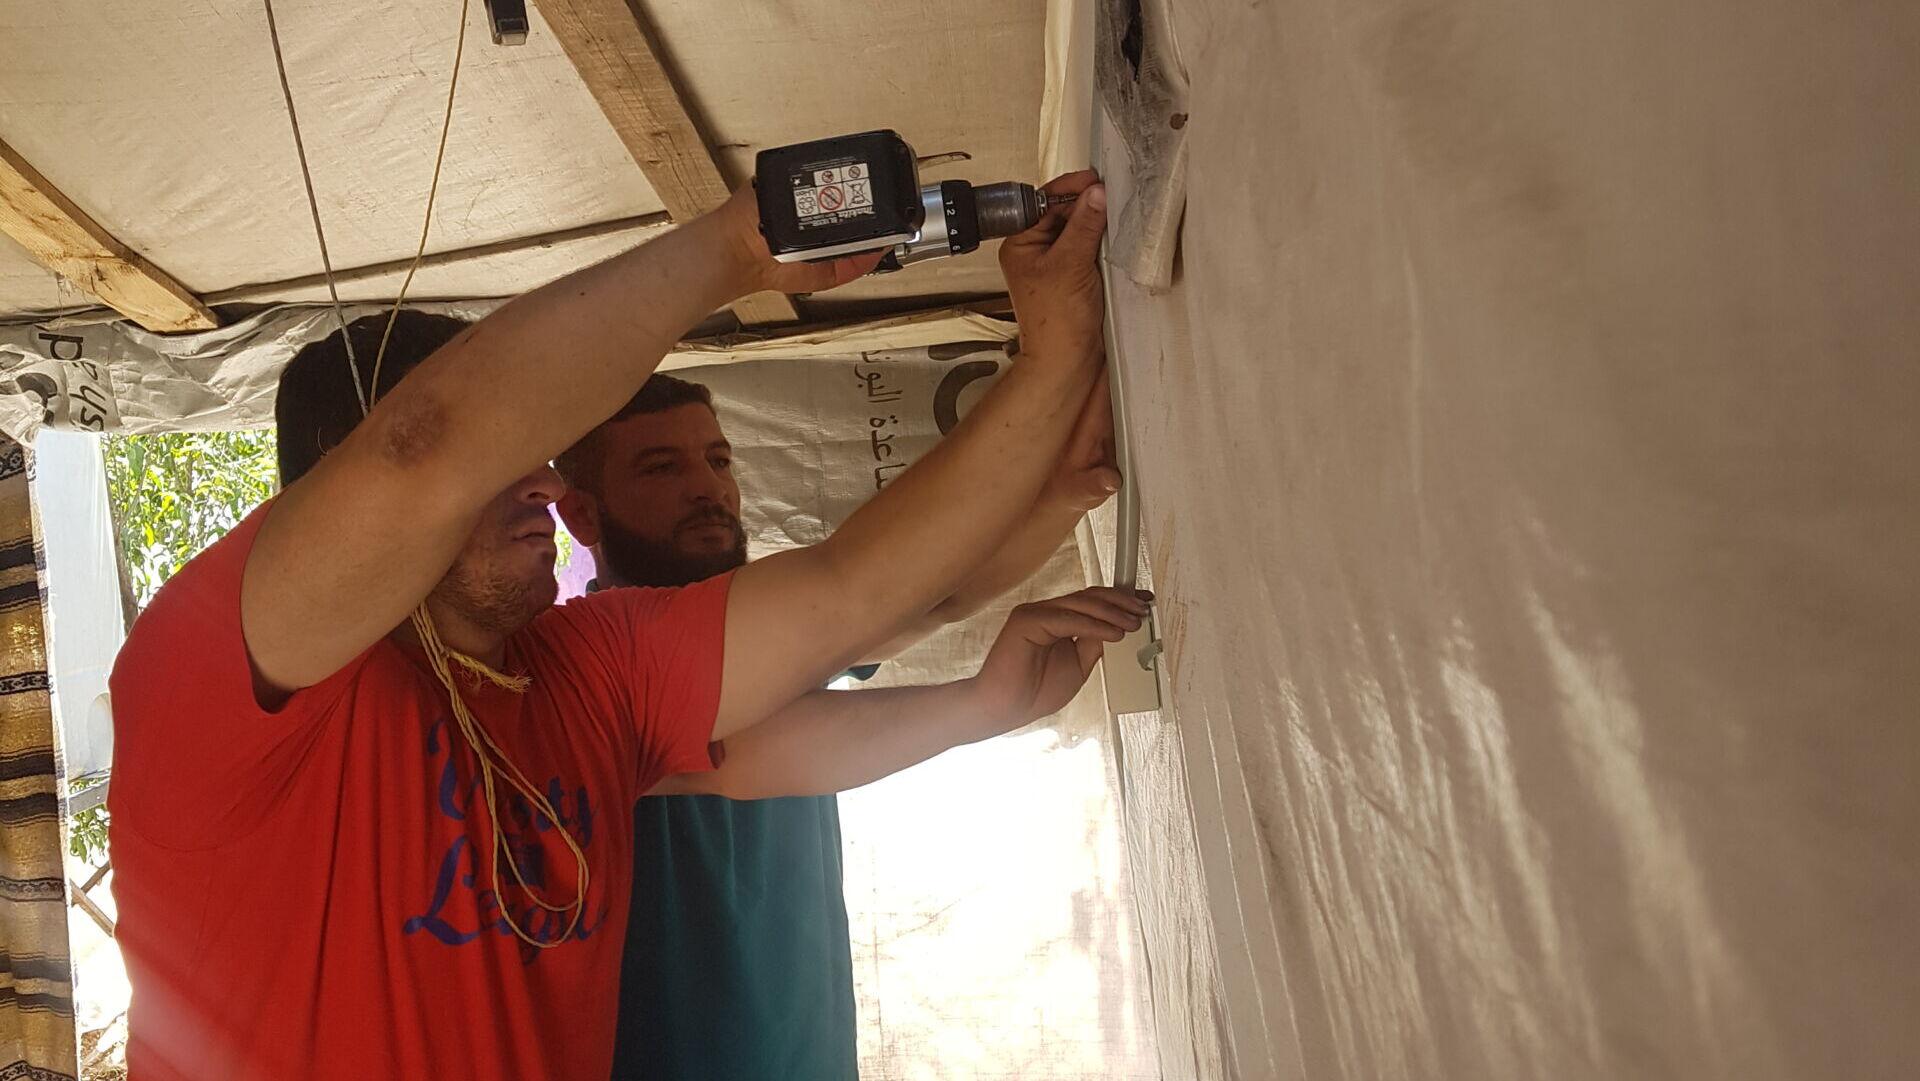 Elektroarbeiten im Libanon